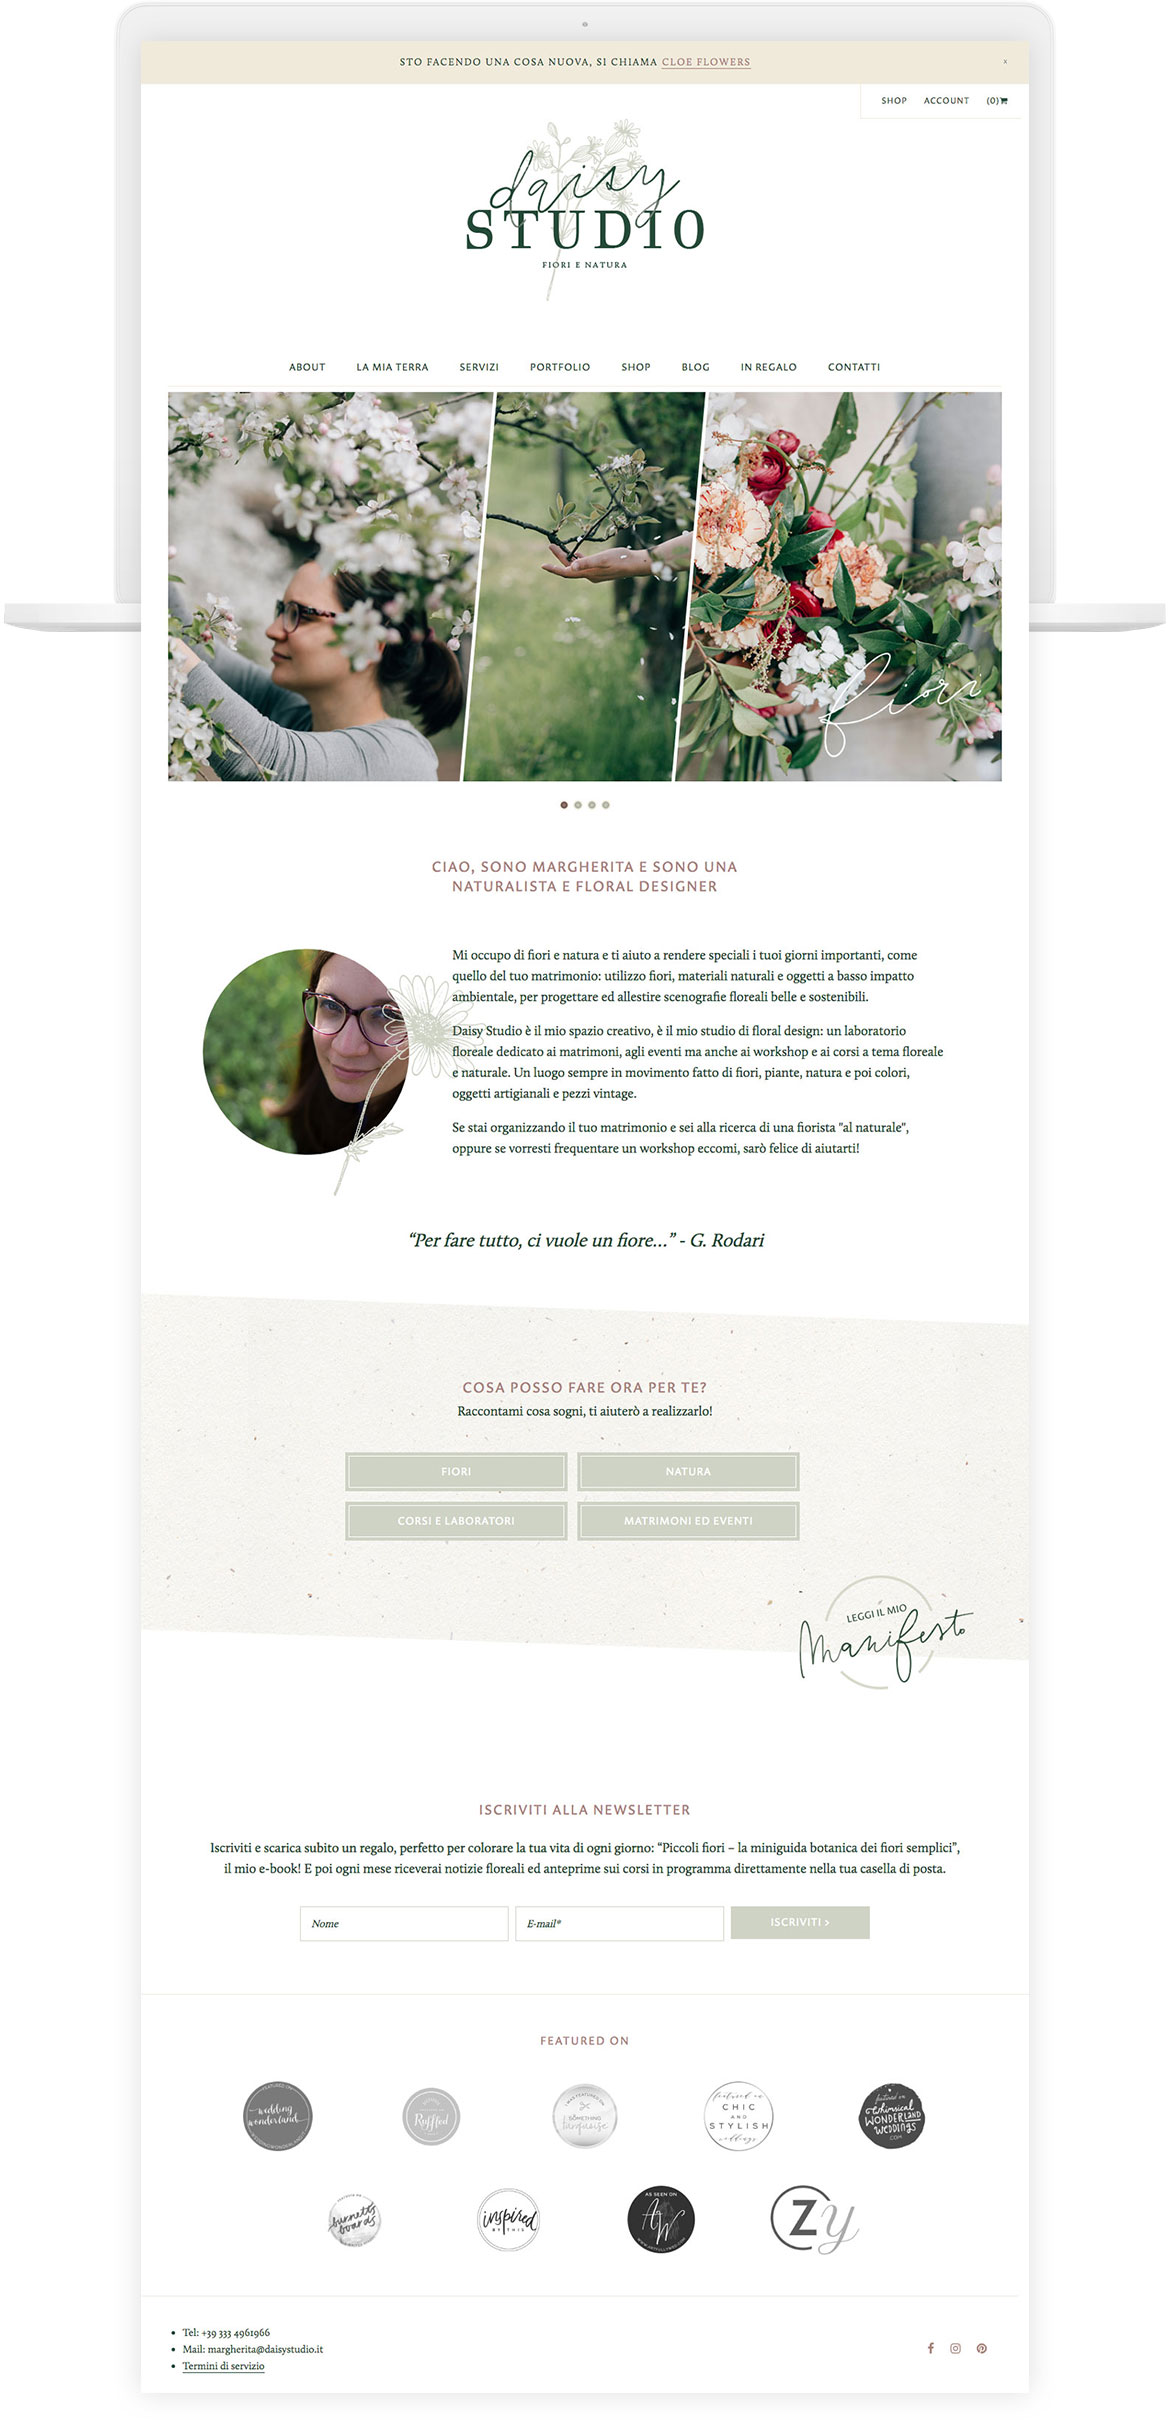 Miel Café Design Portfolio: Web design romantico per floral designer Daisy Studio